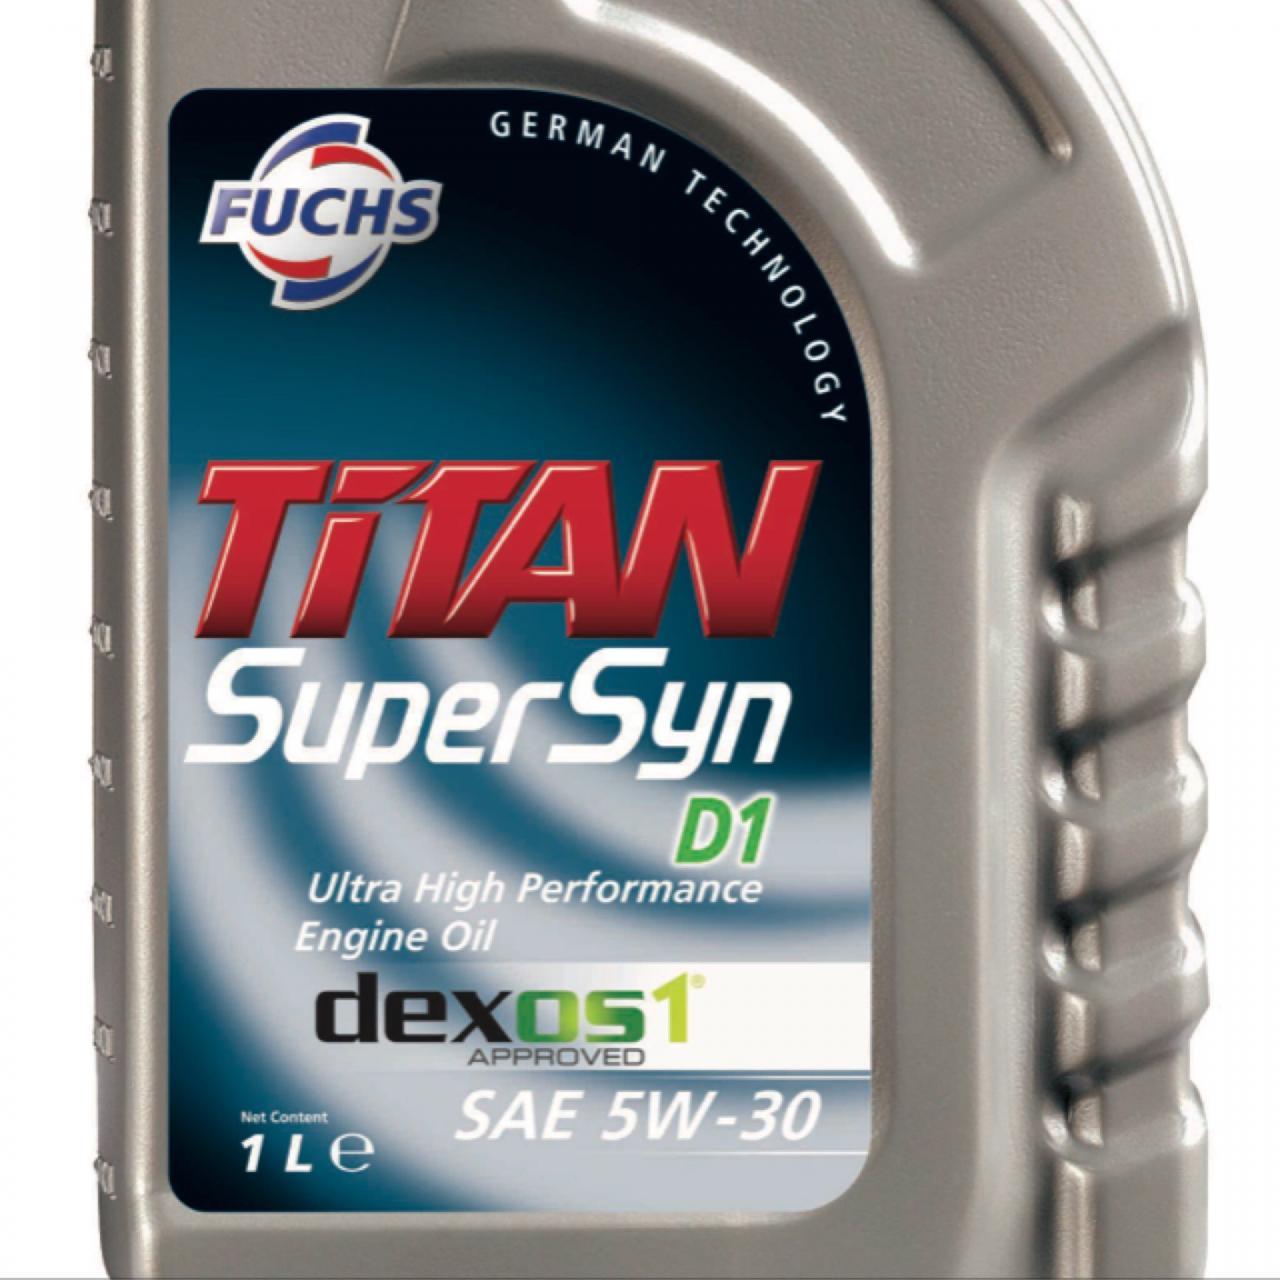 خصائص ومميزات زيت فوكس تيتان 5w30